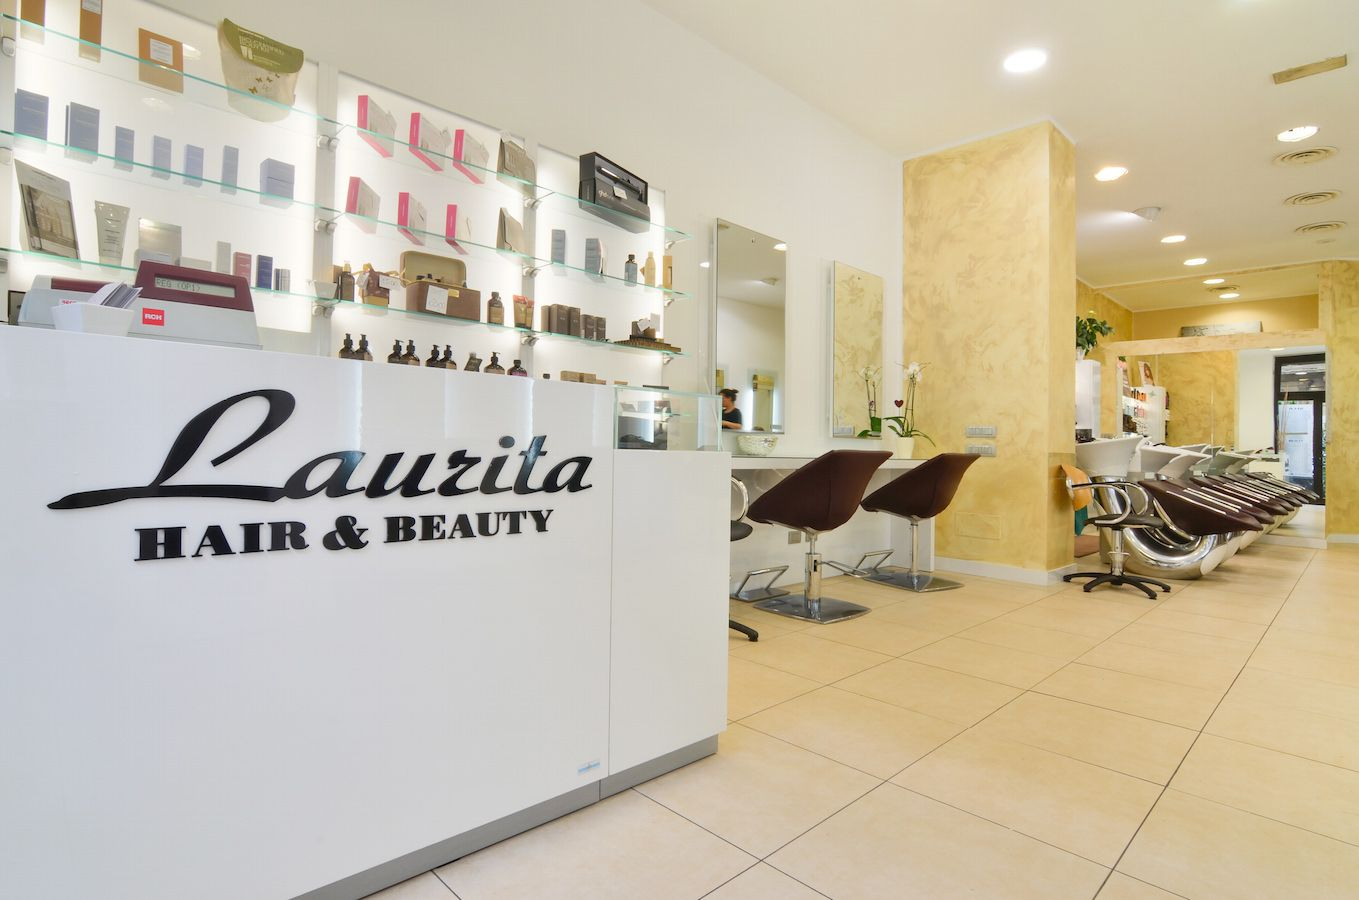 Laurita parrucchieri viale san michele del carso 16 for Arredamento parrucchieri milano